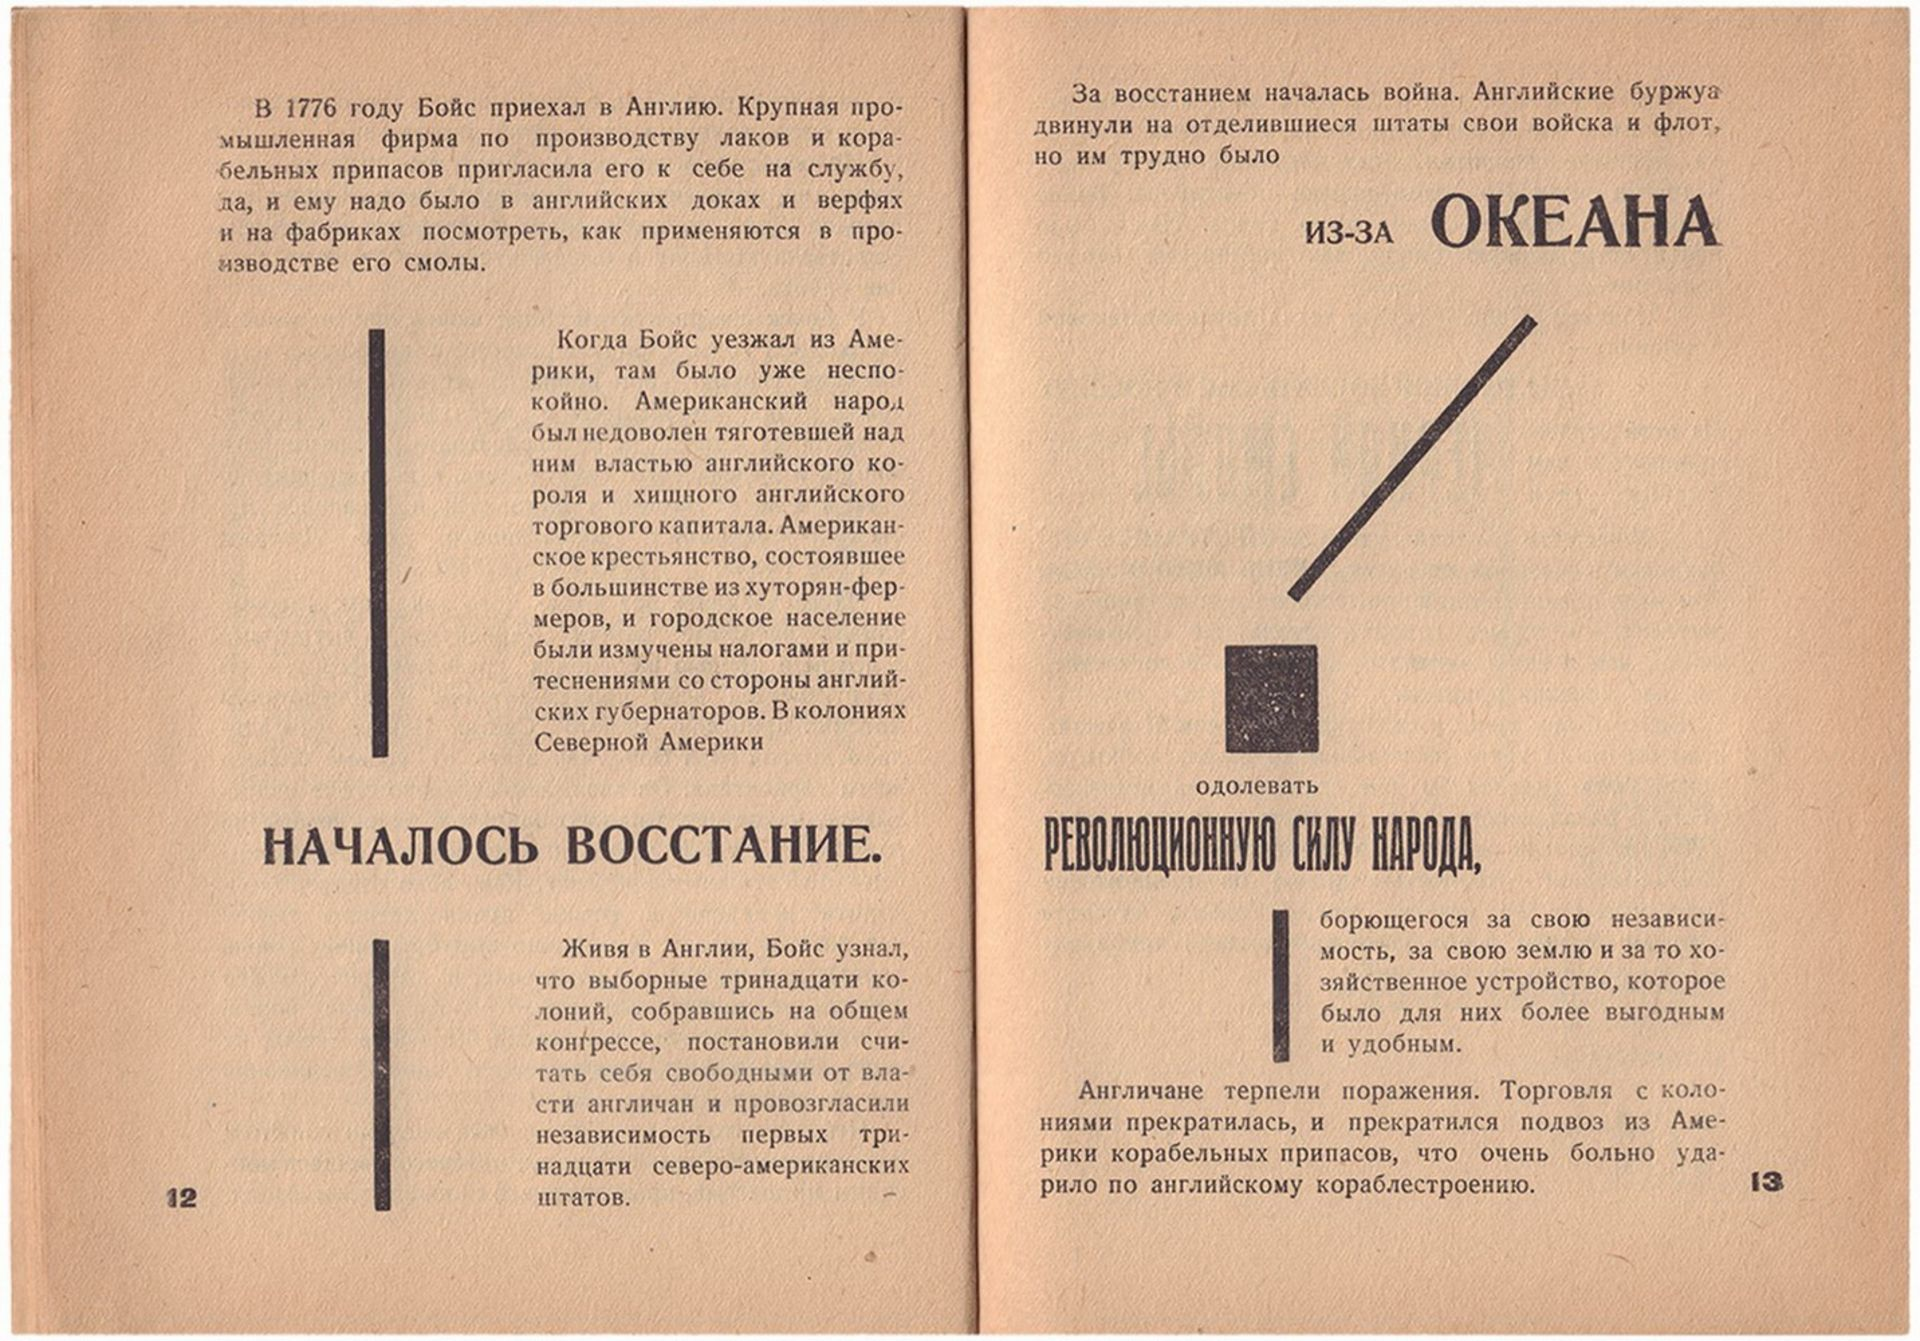 [Soviet art]. Ievlev, S. Our north Turpentine / S.F. Ievlev. - Arkhangelsk, 1931. - 80 pp.: ill.; 29 - Bild 4 aus 6